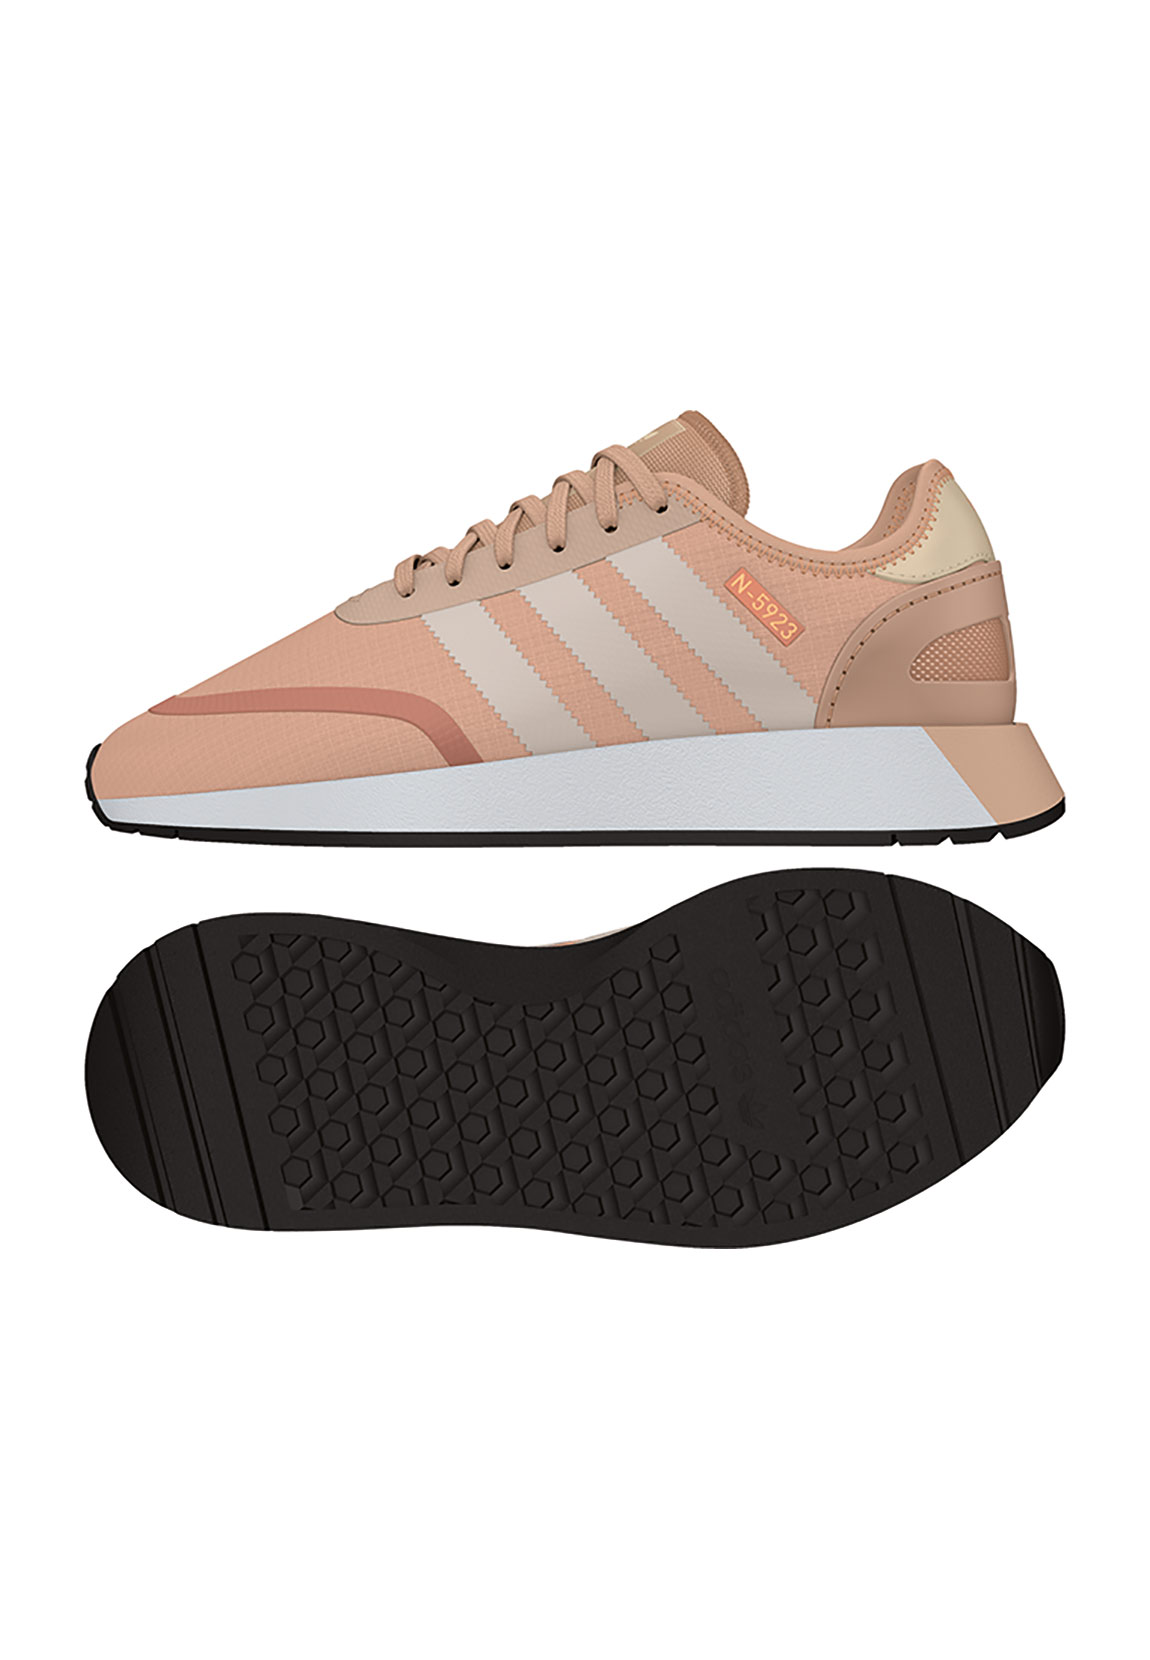 Details zu Adidas Sneaker Damen Iniki N 5923 W AQ0265 Rosa